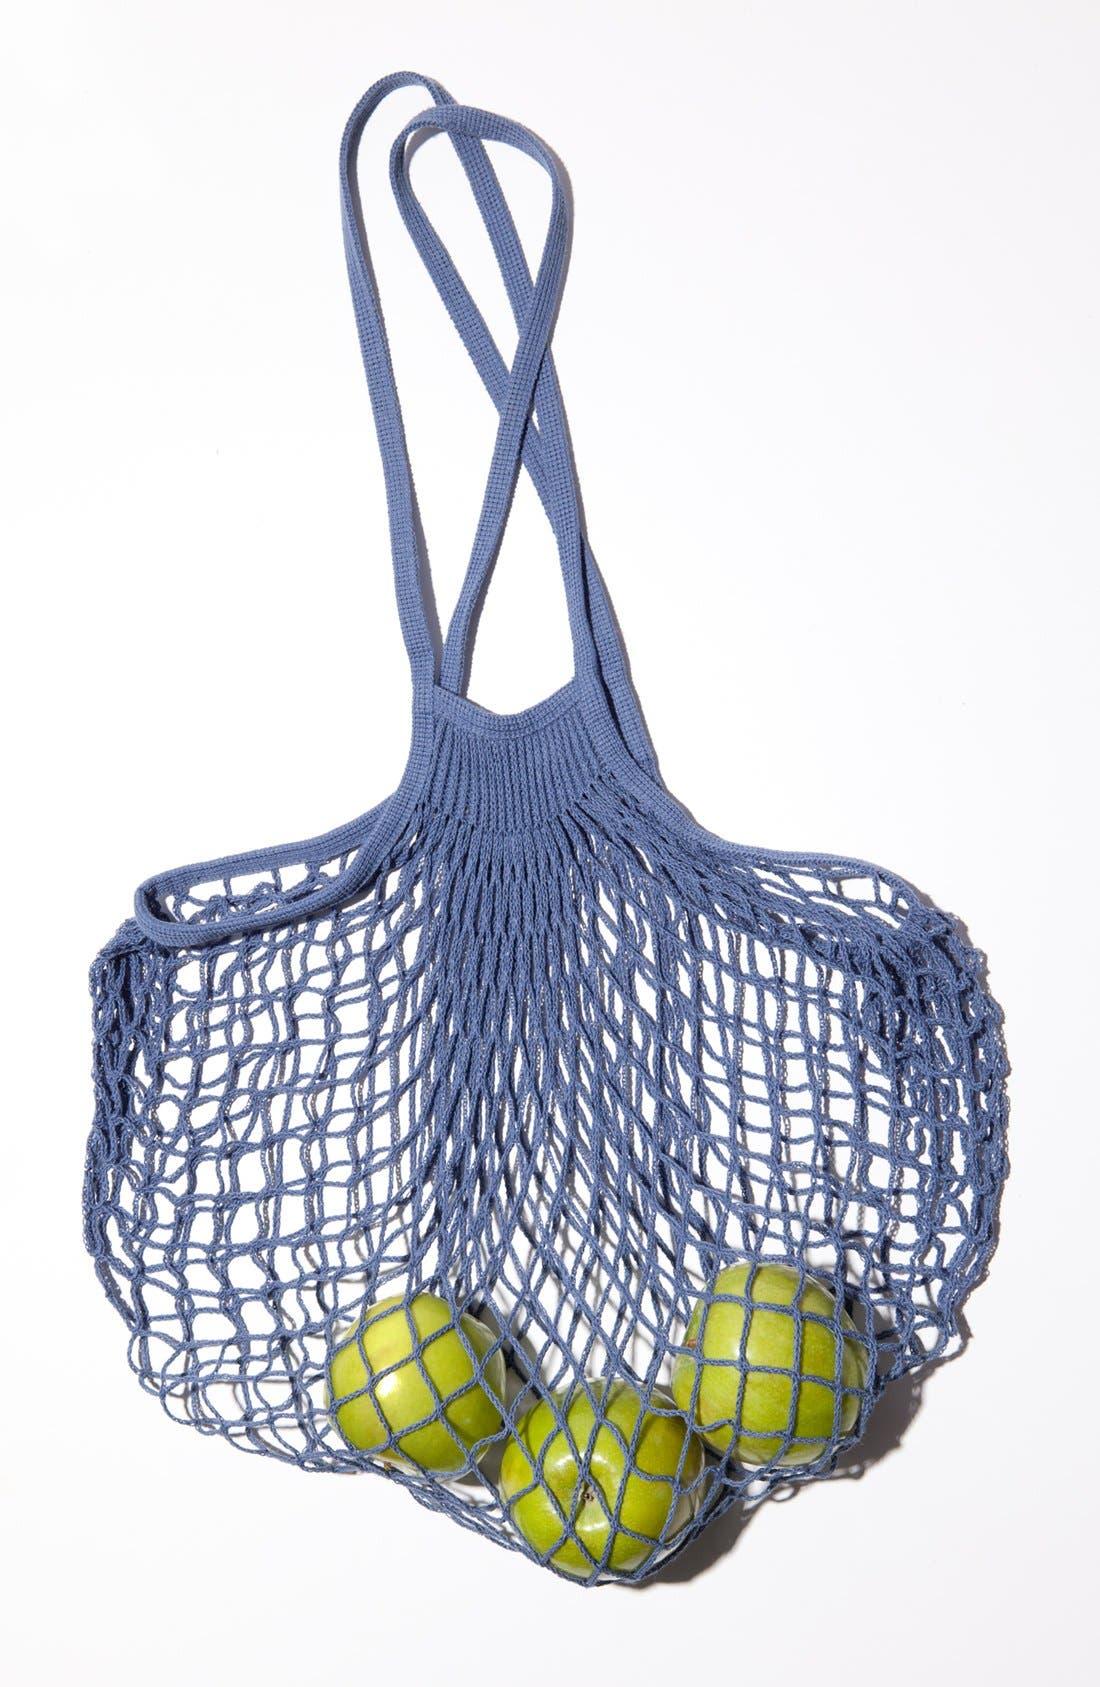 Alternate Image 2  - Merci 'Filet à Provision' Bleu Net Shopping Bag